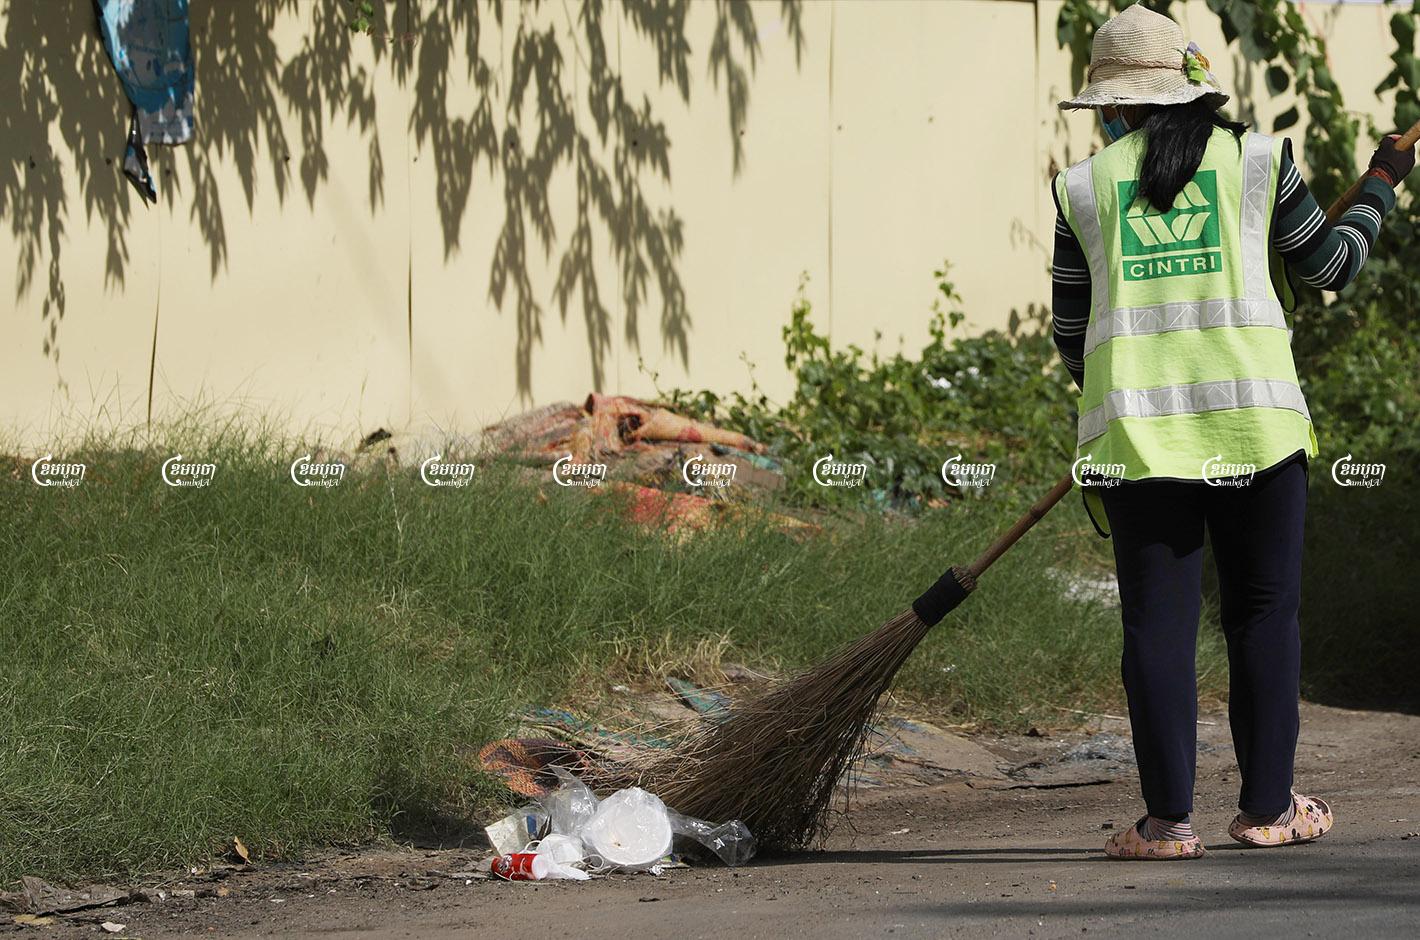 A Cintri worker sweeps the street in Tonle Bassac commune, Chamkar Mon district, August 17, 2021. CamboJA/ Pring Samrang